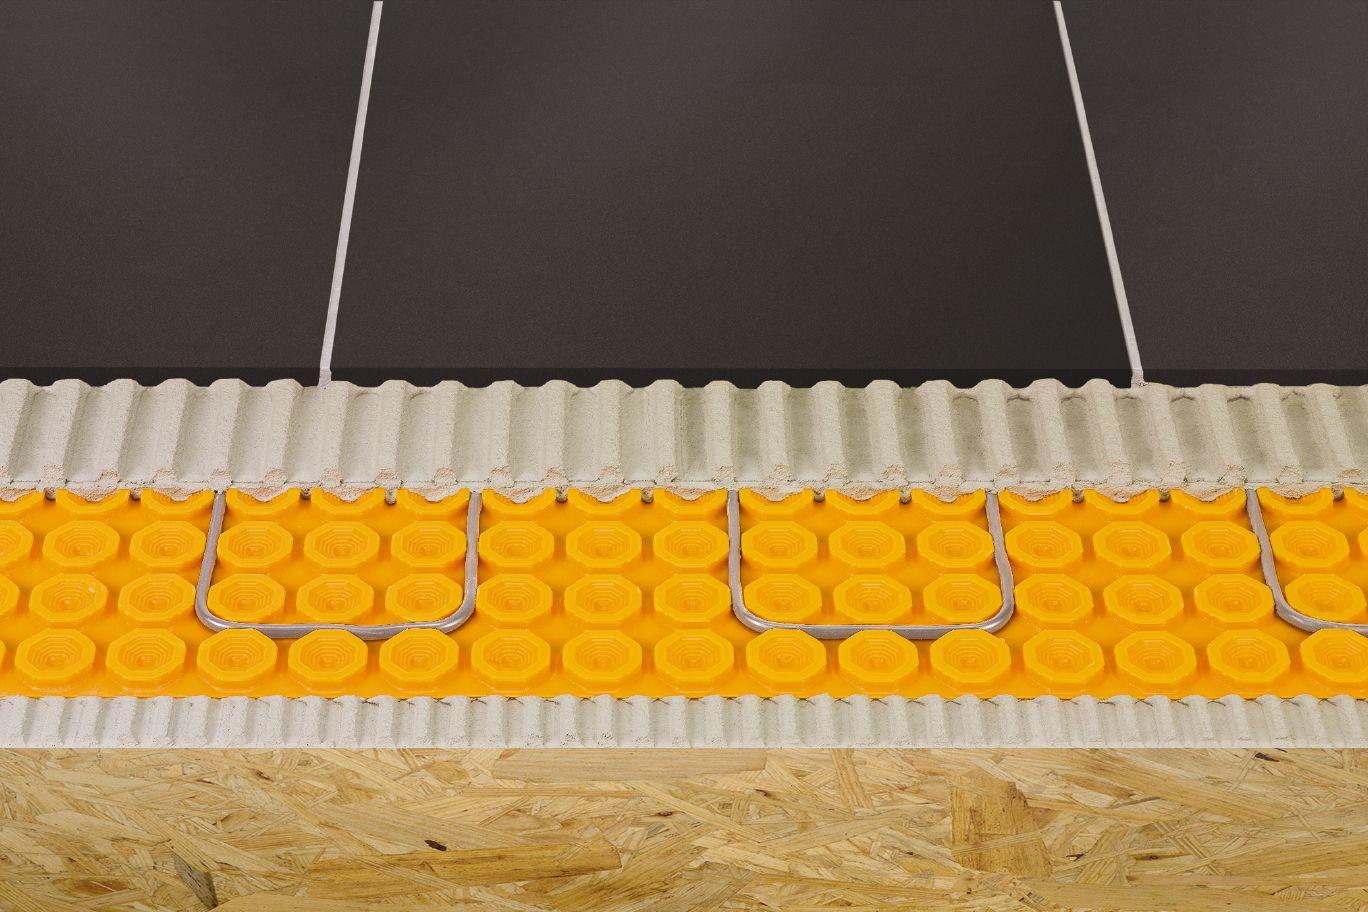 How to Match Hardwood Floors Of Schlutera Ditra Heat Floor Warming Schluter Com Throughout Schlutera Ditra Heat